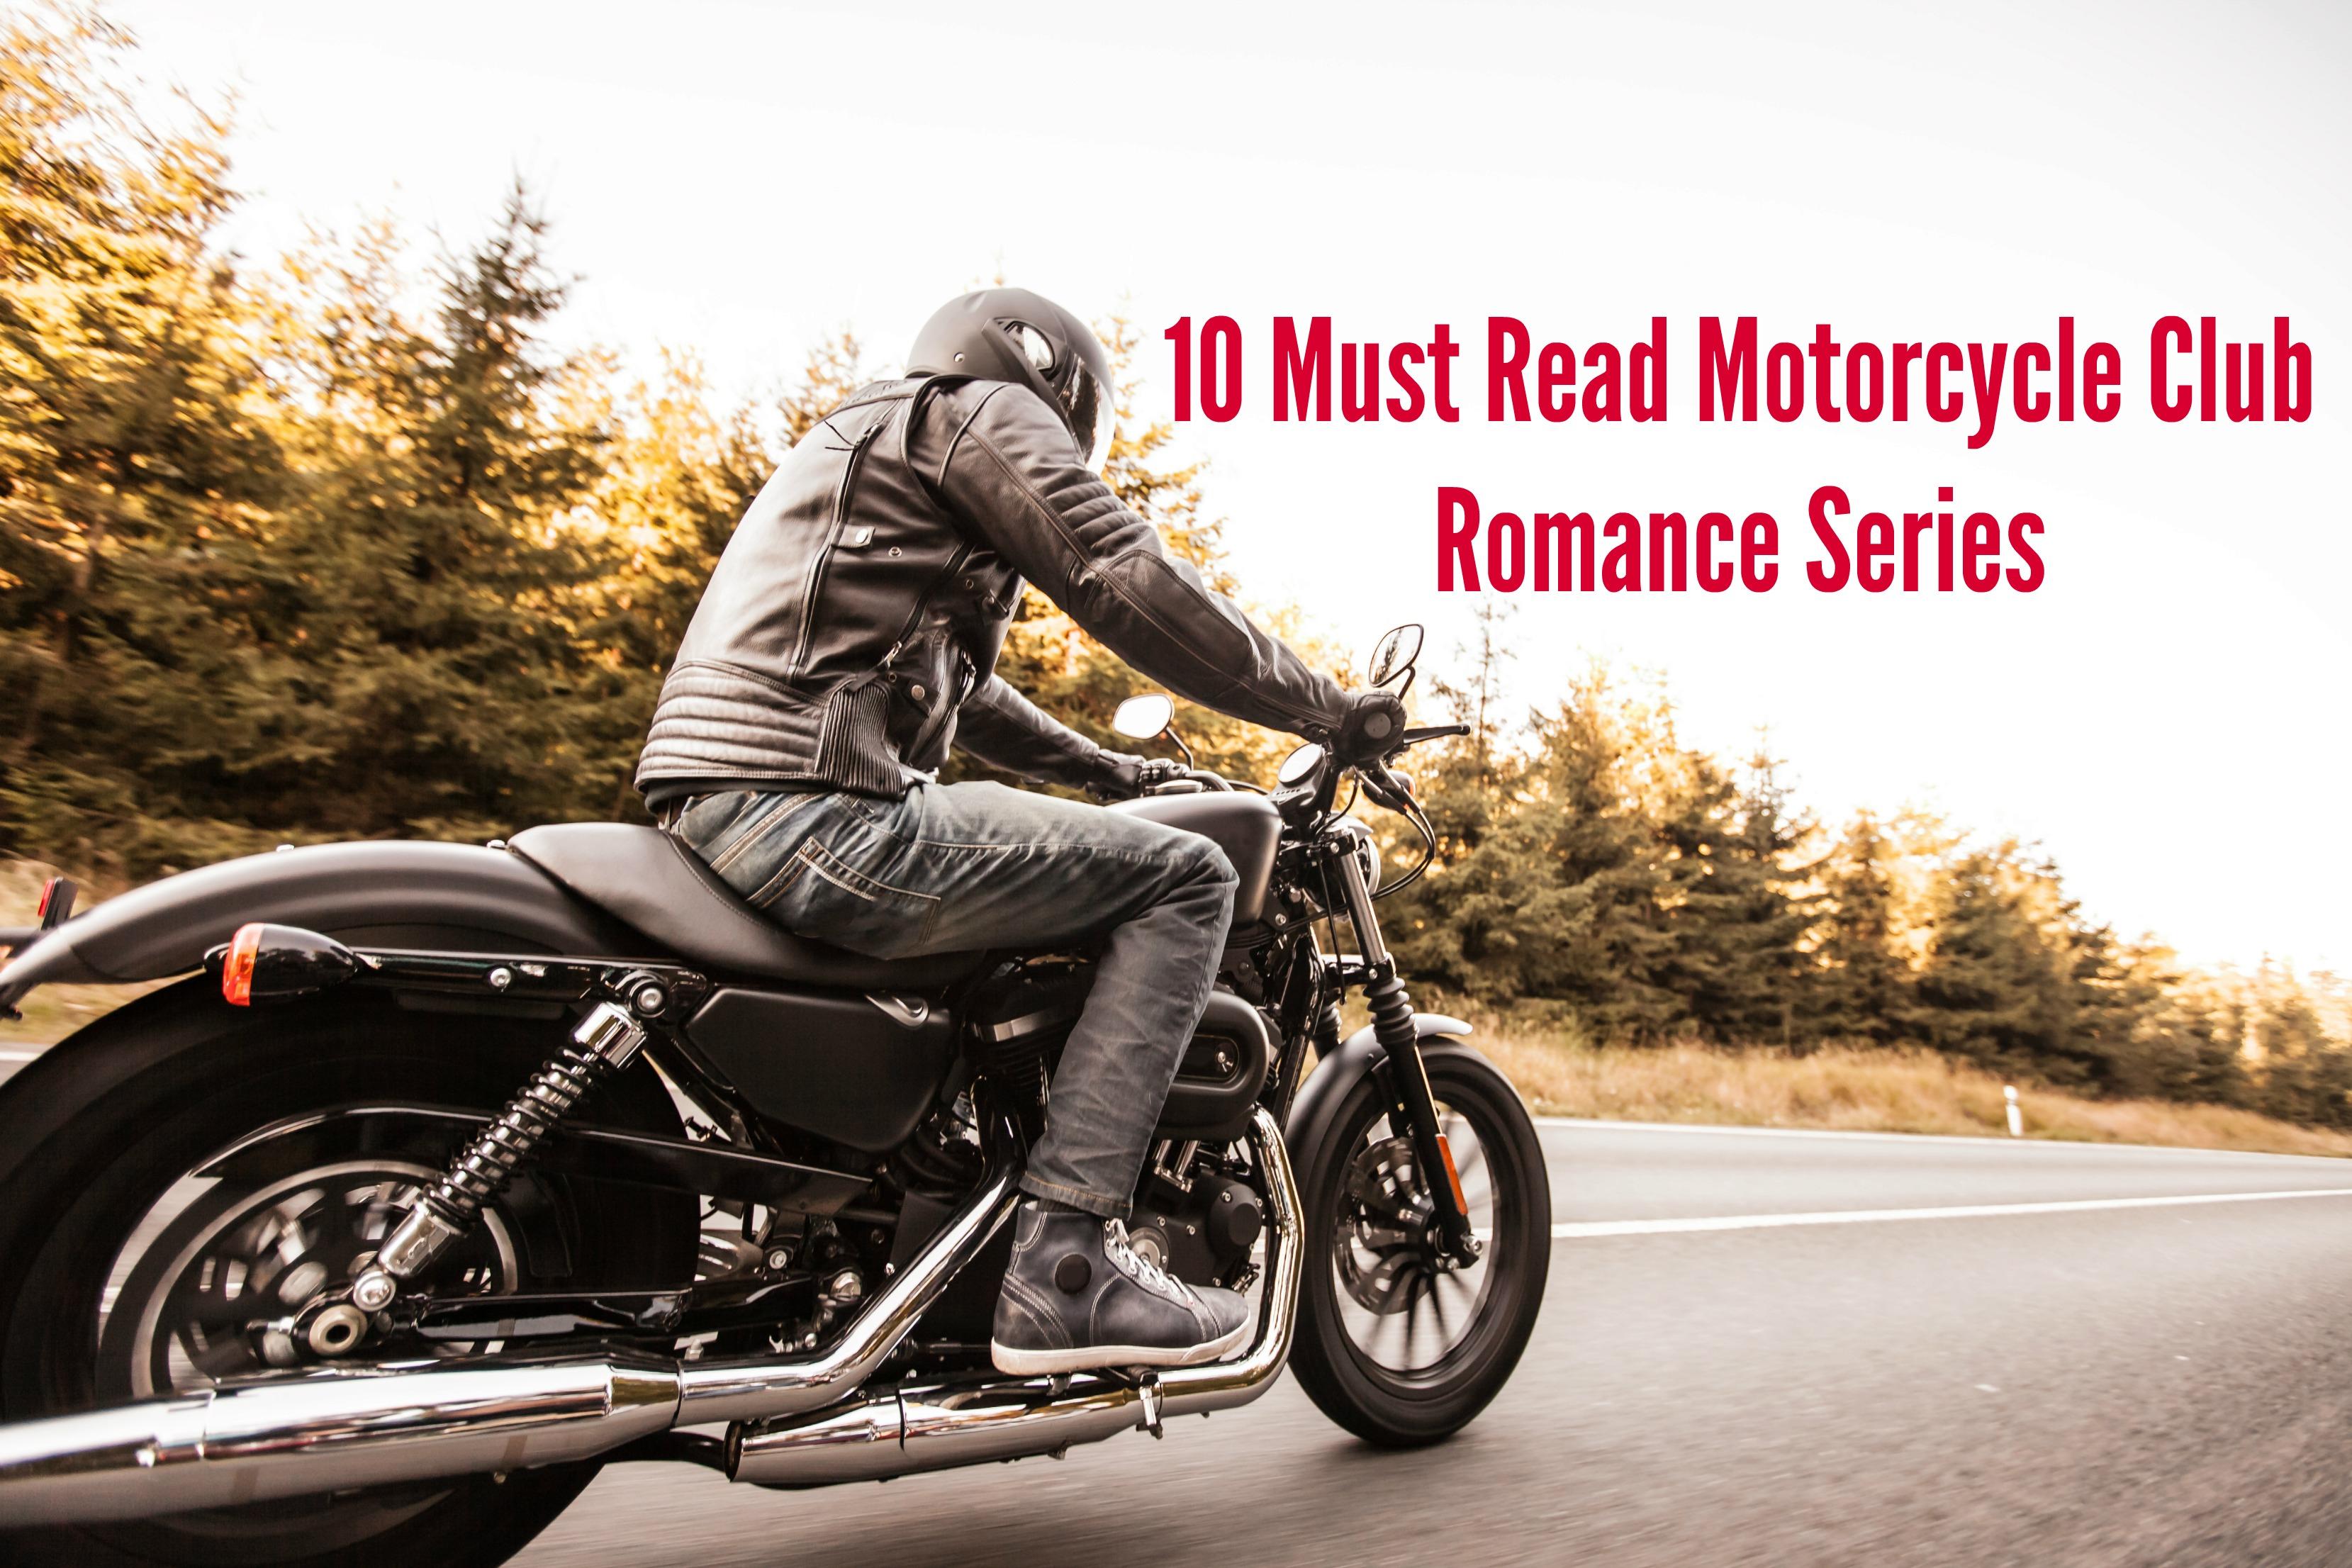 10 Must Read Motorcycle Club Romance Series